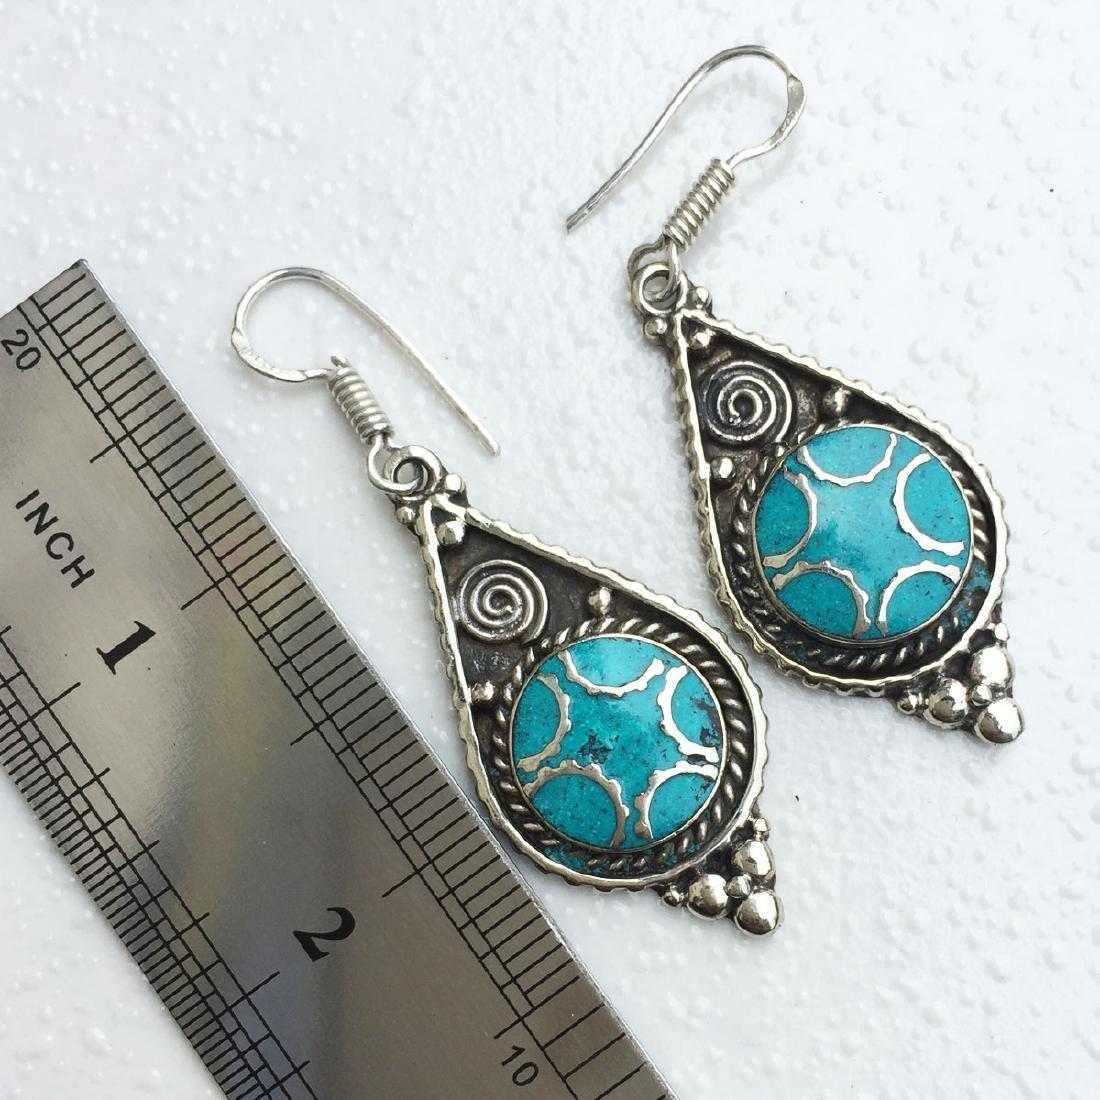 Vintage Tibetan Turquoise Beaded Earrings